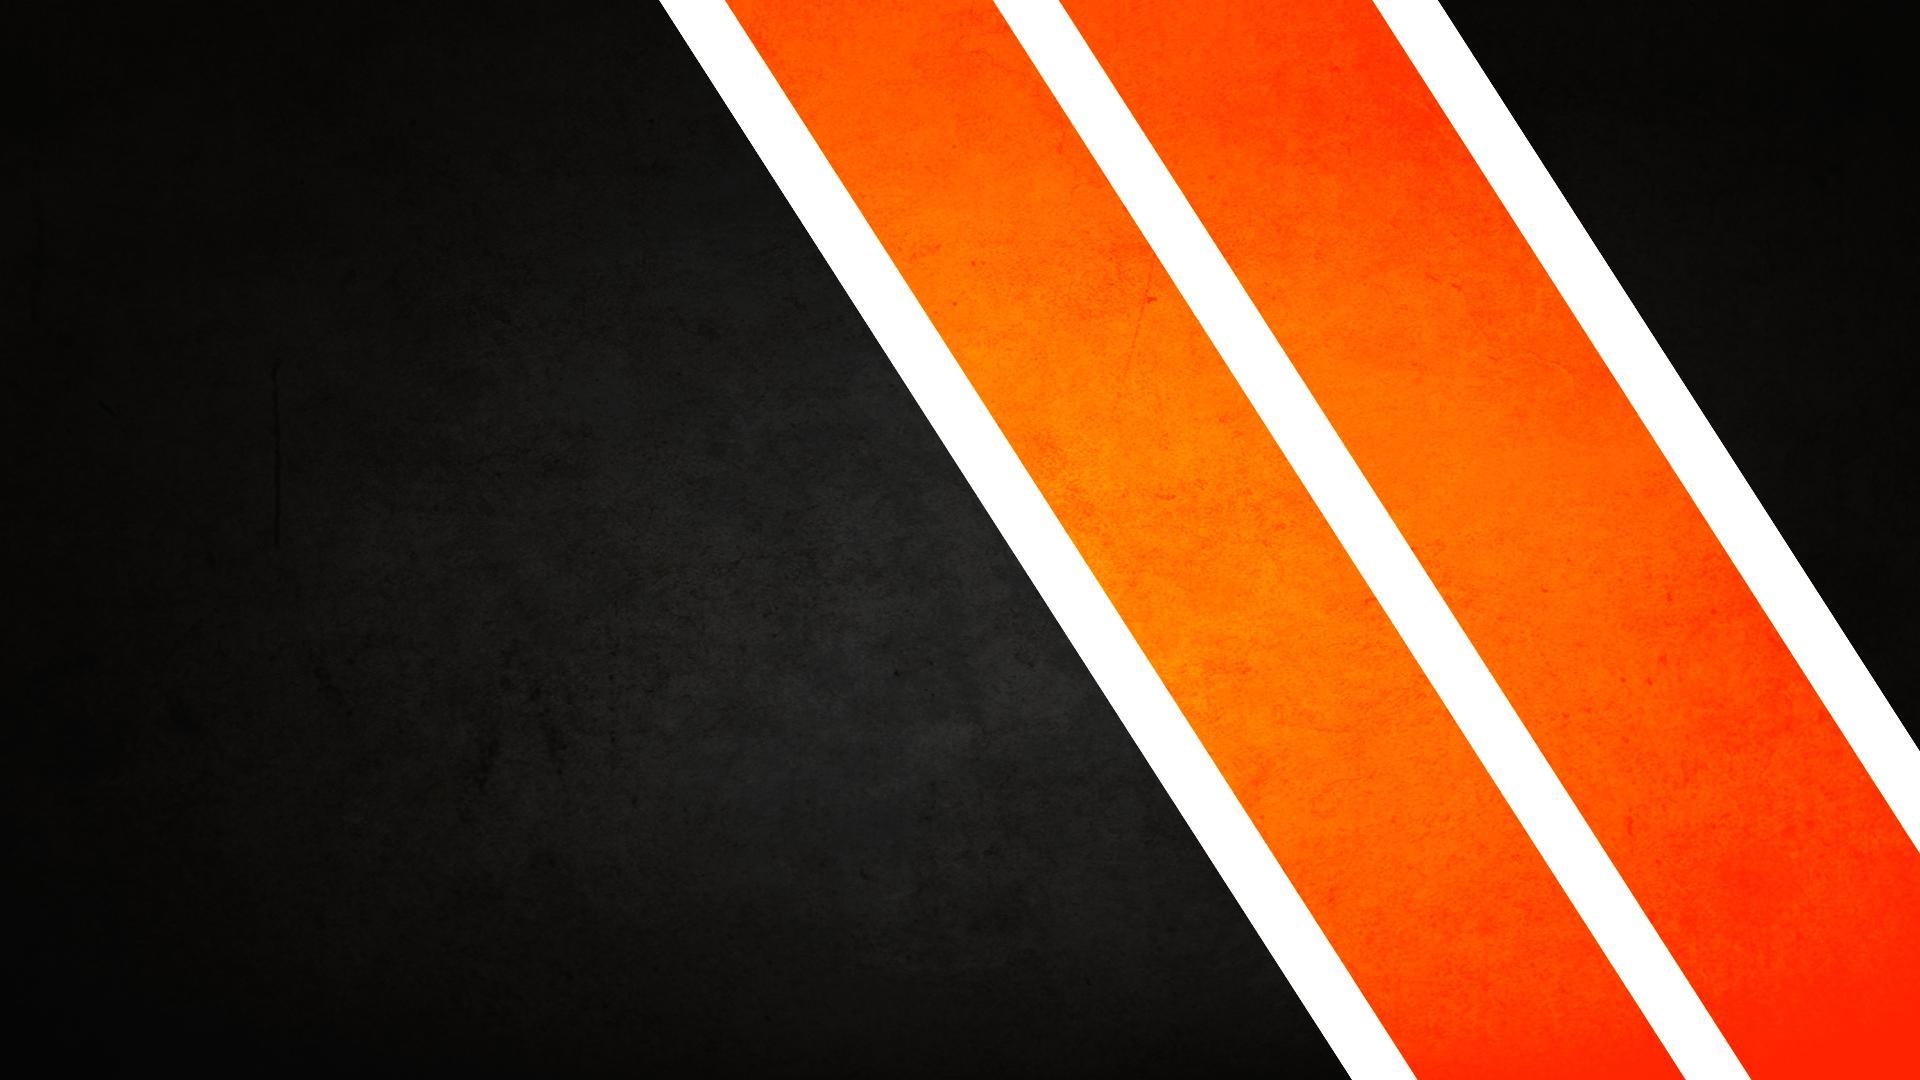 wallpaper black and orange - photo #21